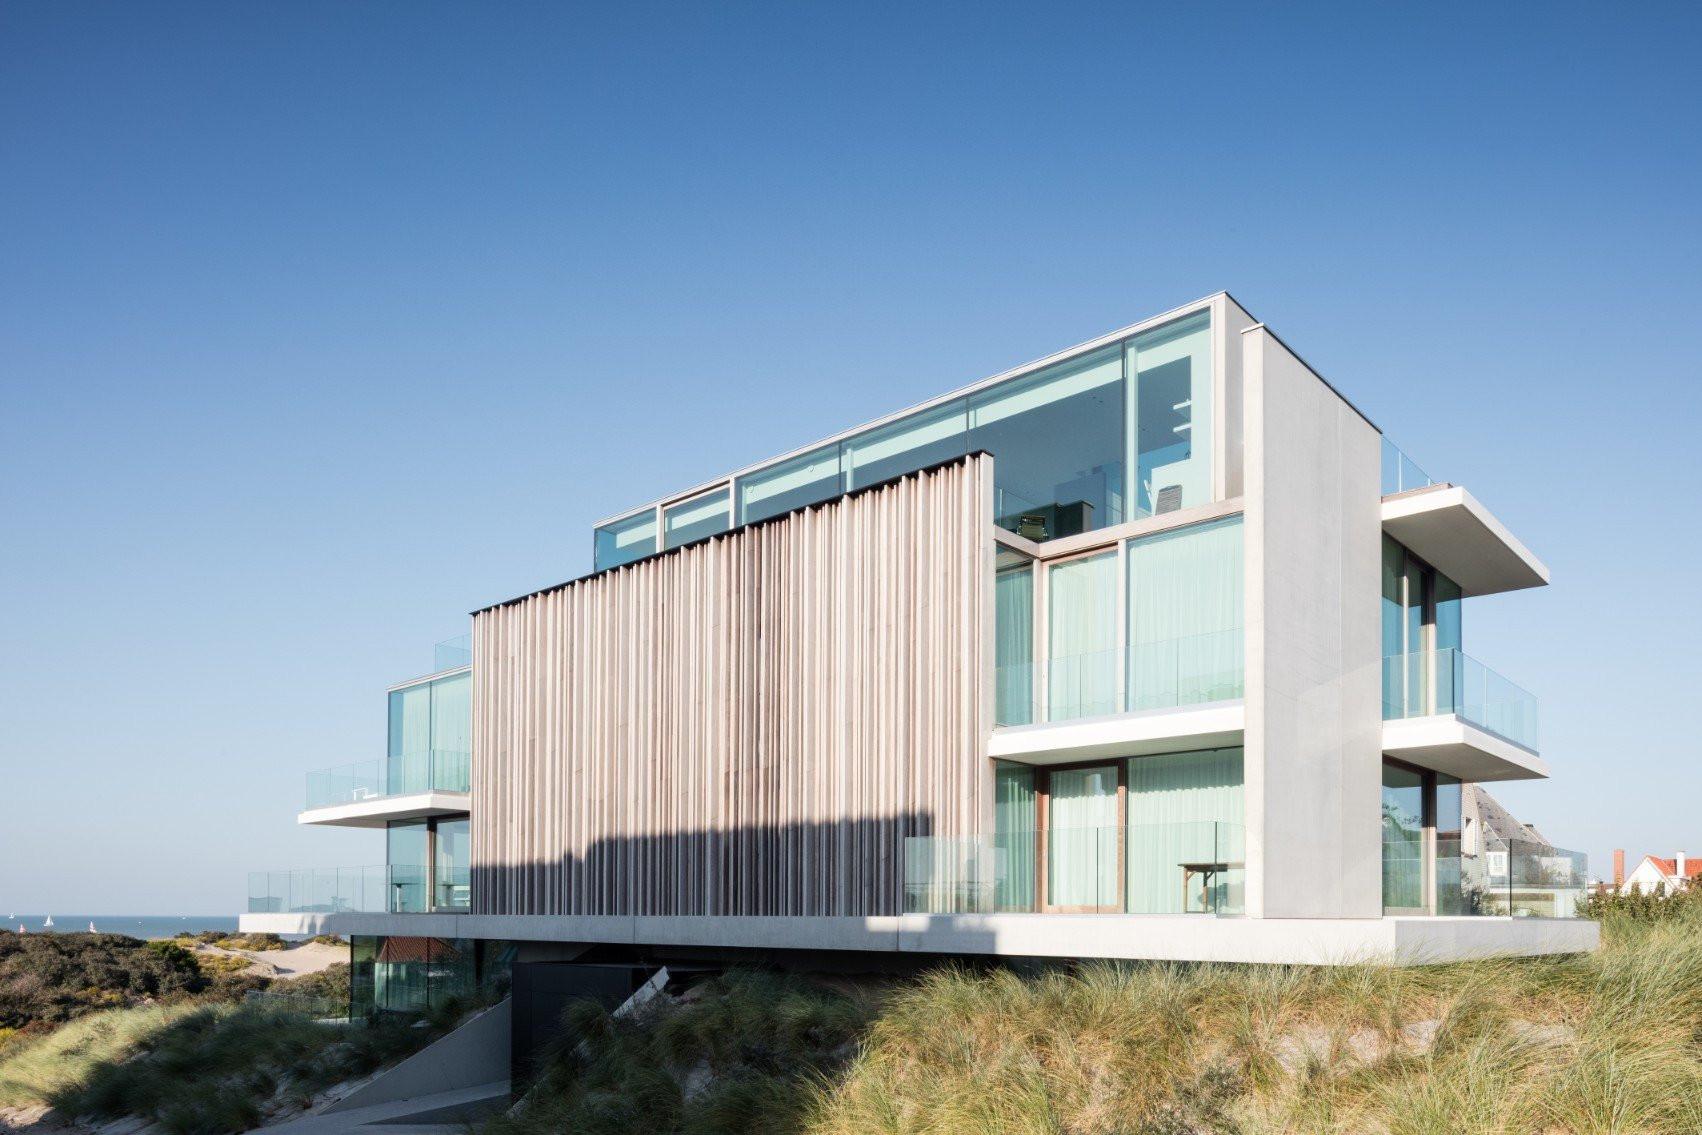 Rietveldprojects-Residence-ON-appartement-design-architectuur-kust-tvdv5_1702x0.jpg